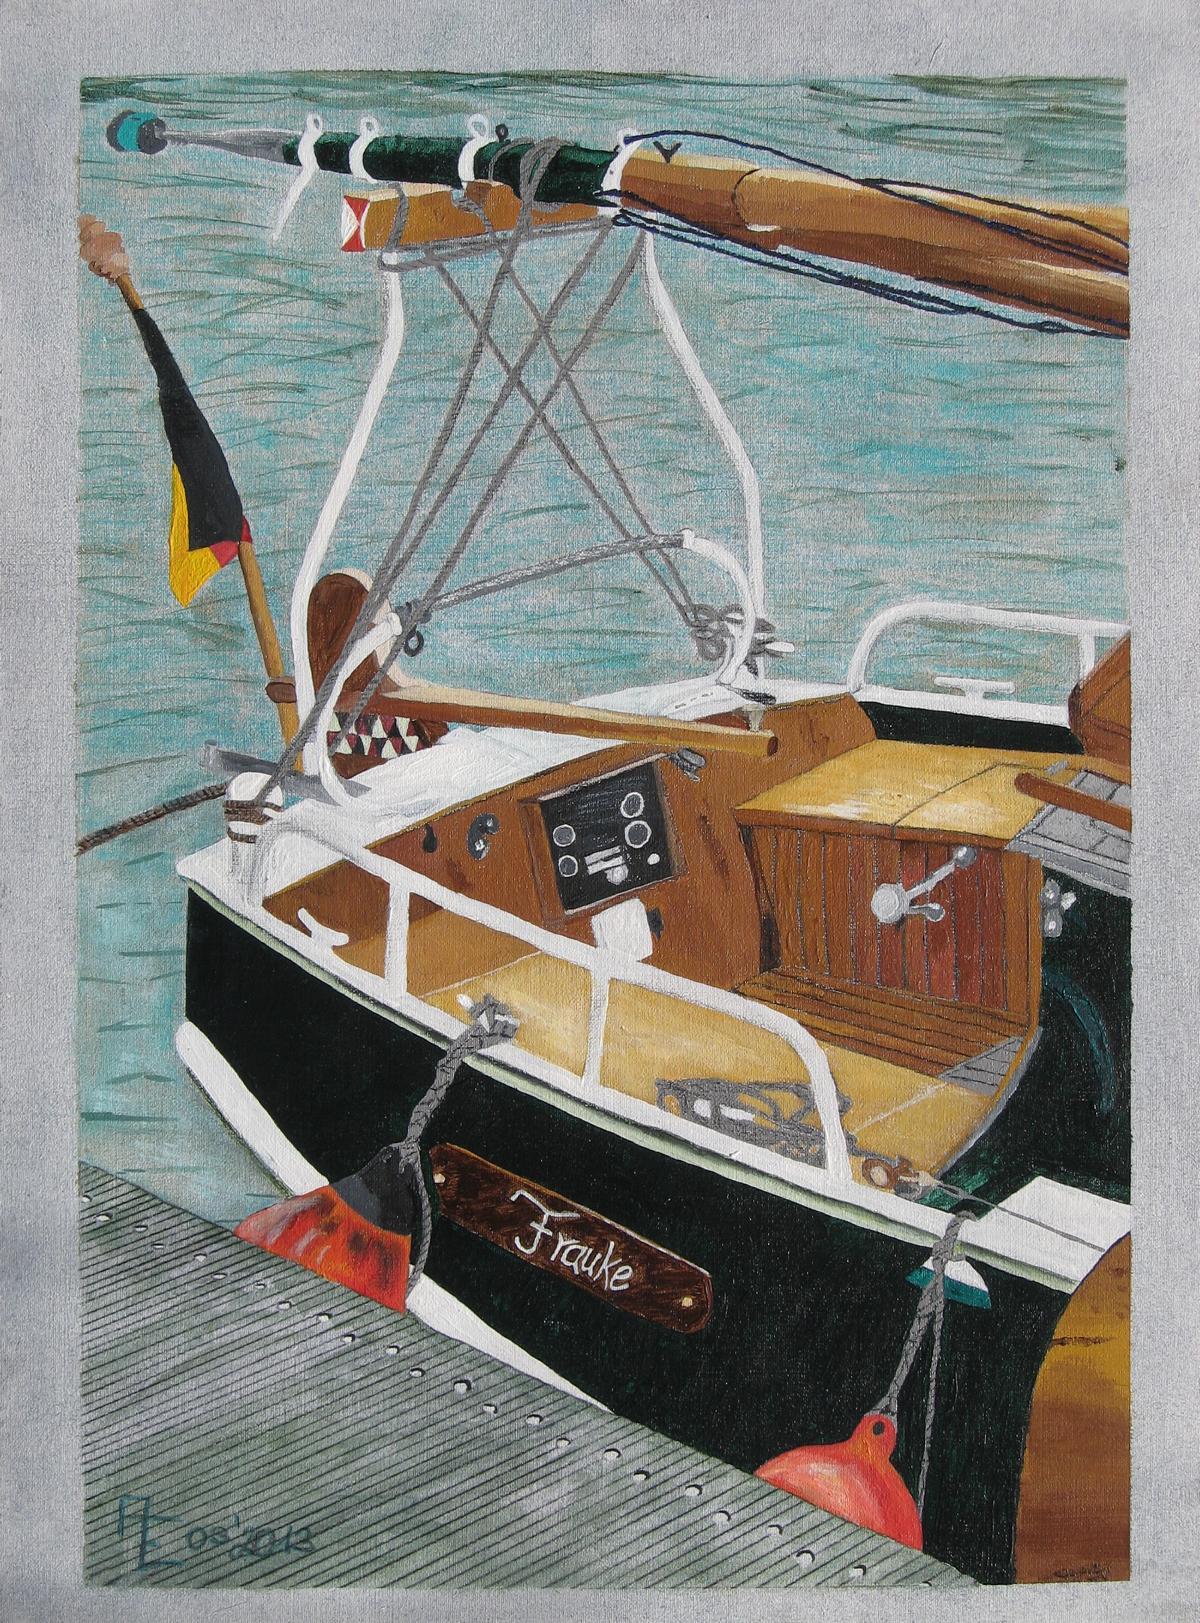 2013-03 Frauke - Mischtechnik auf Ölmalpapier 42x56